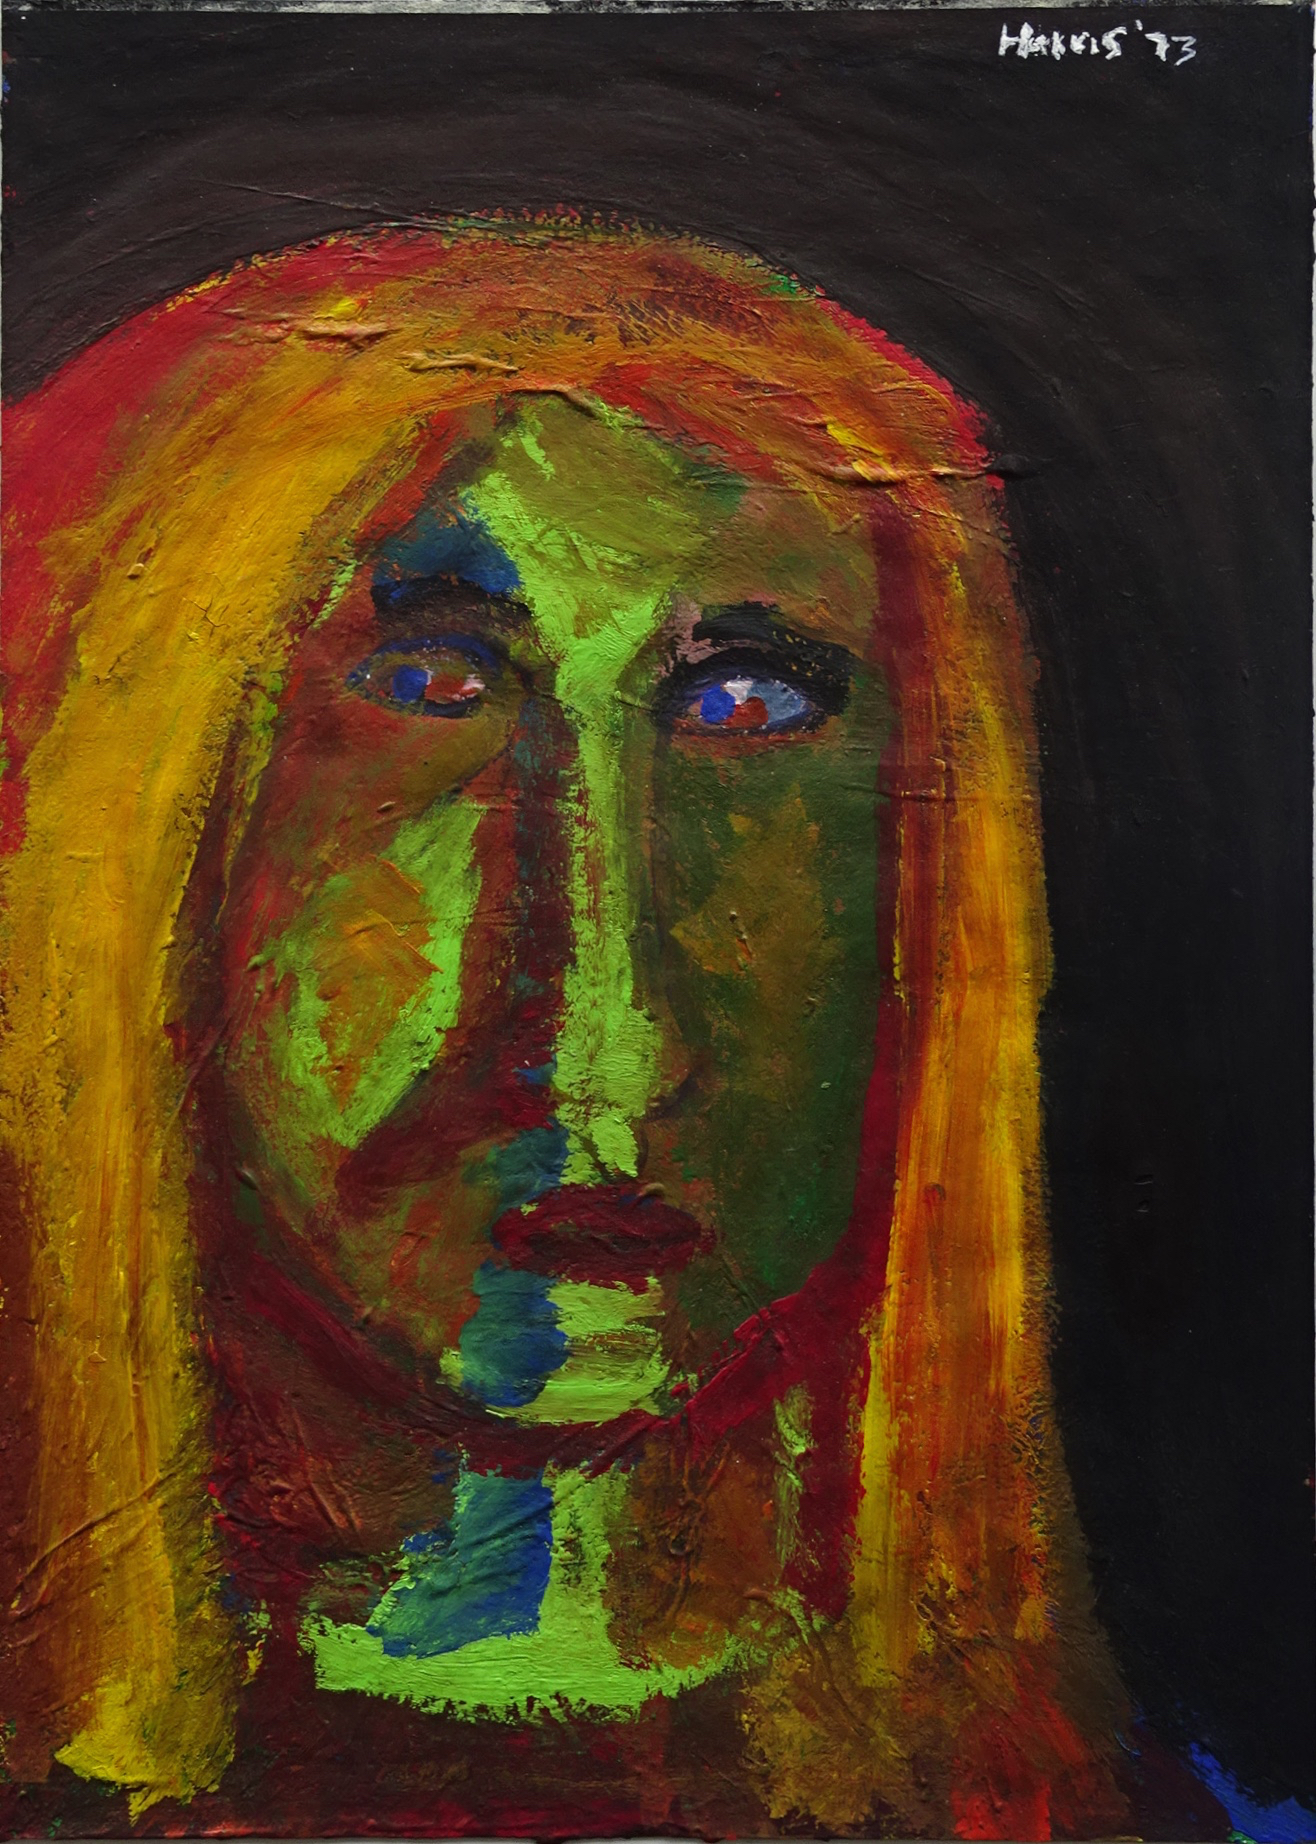 Jeffrey Harris  Untitled portrait , 1973 Gouache on paper 355 x 255 mm [Private collection]  ______